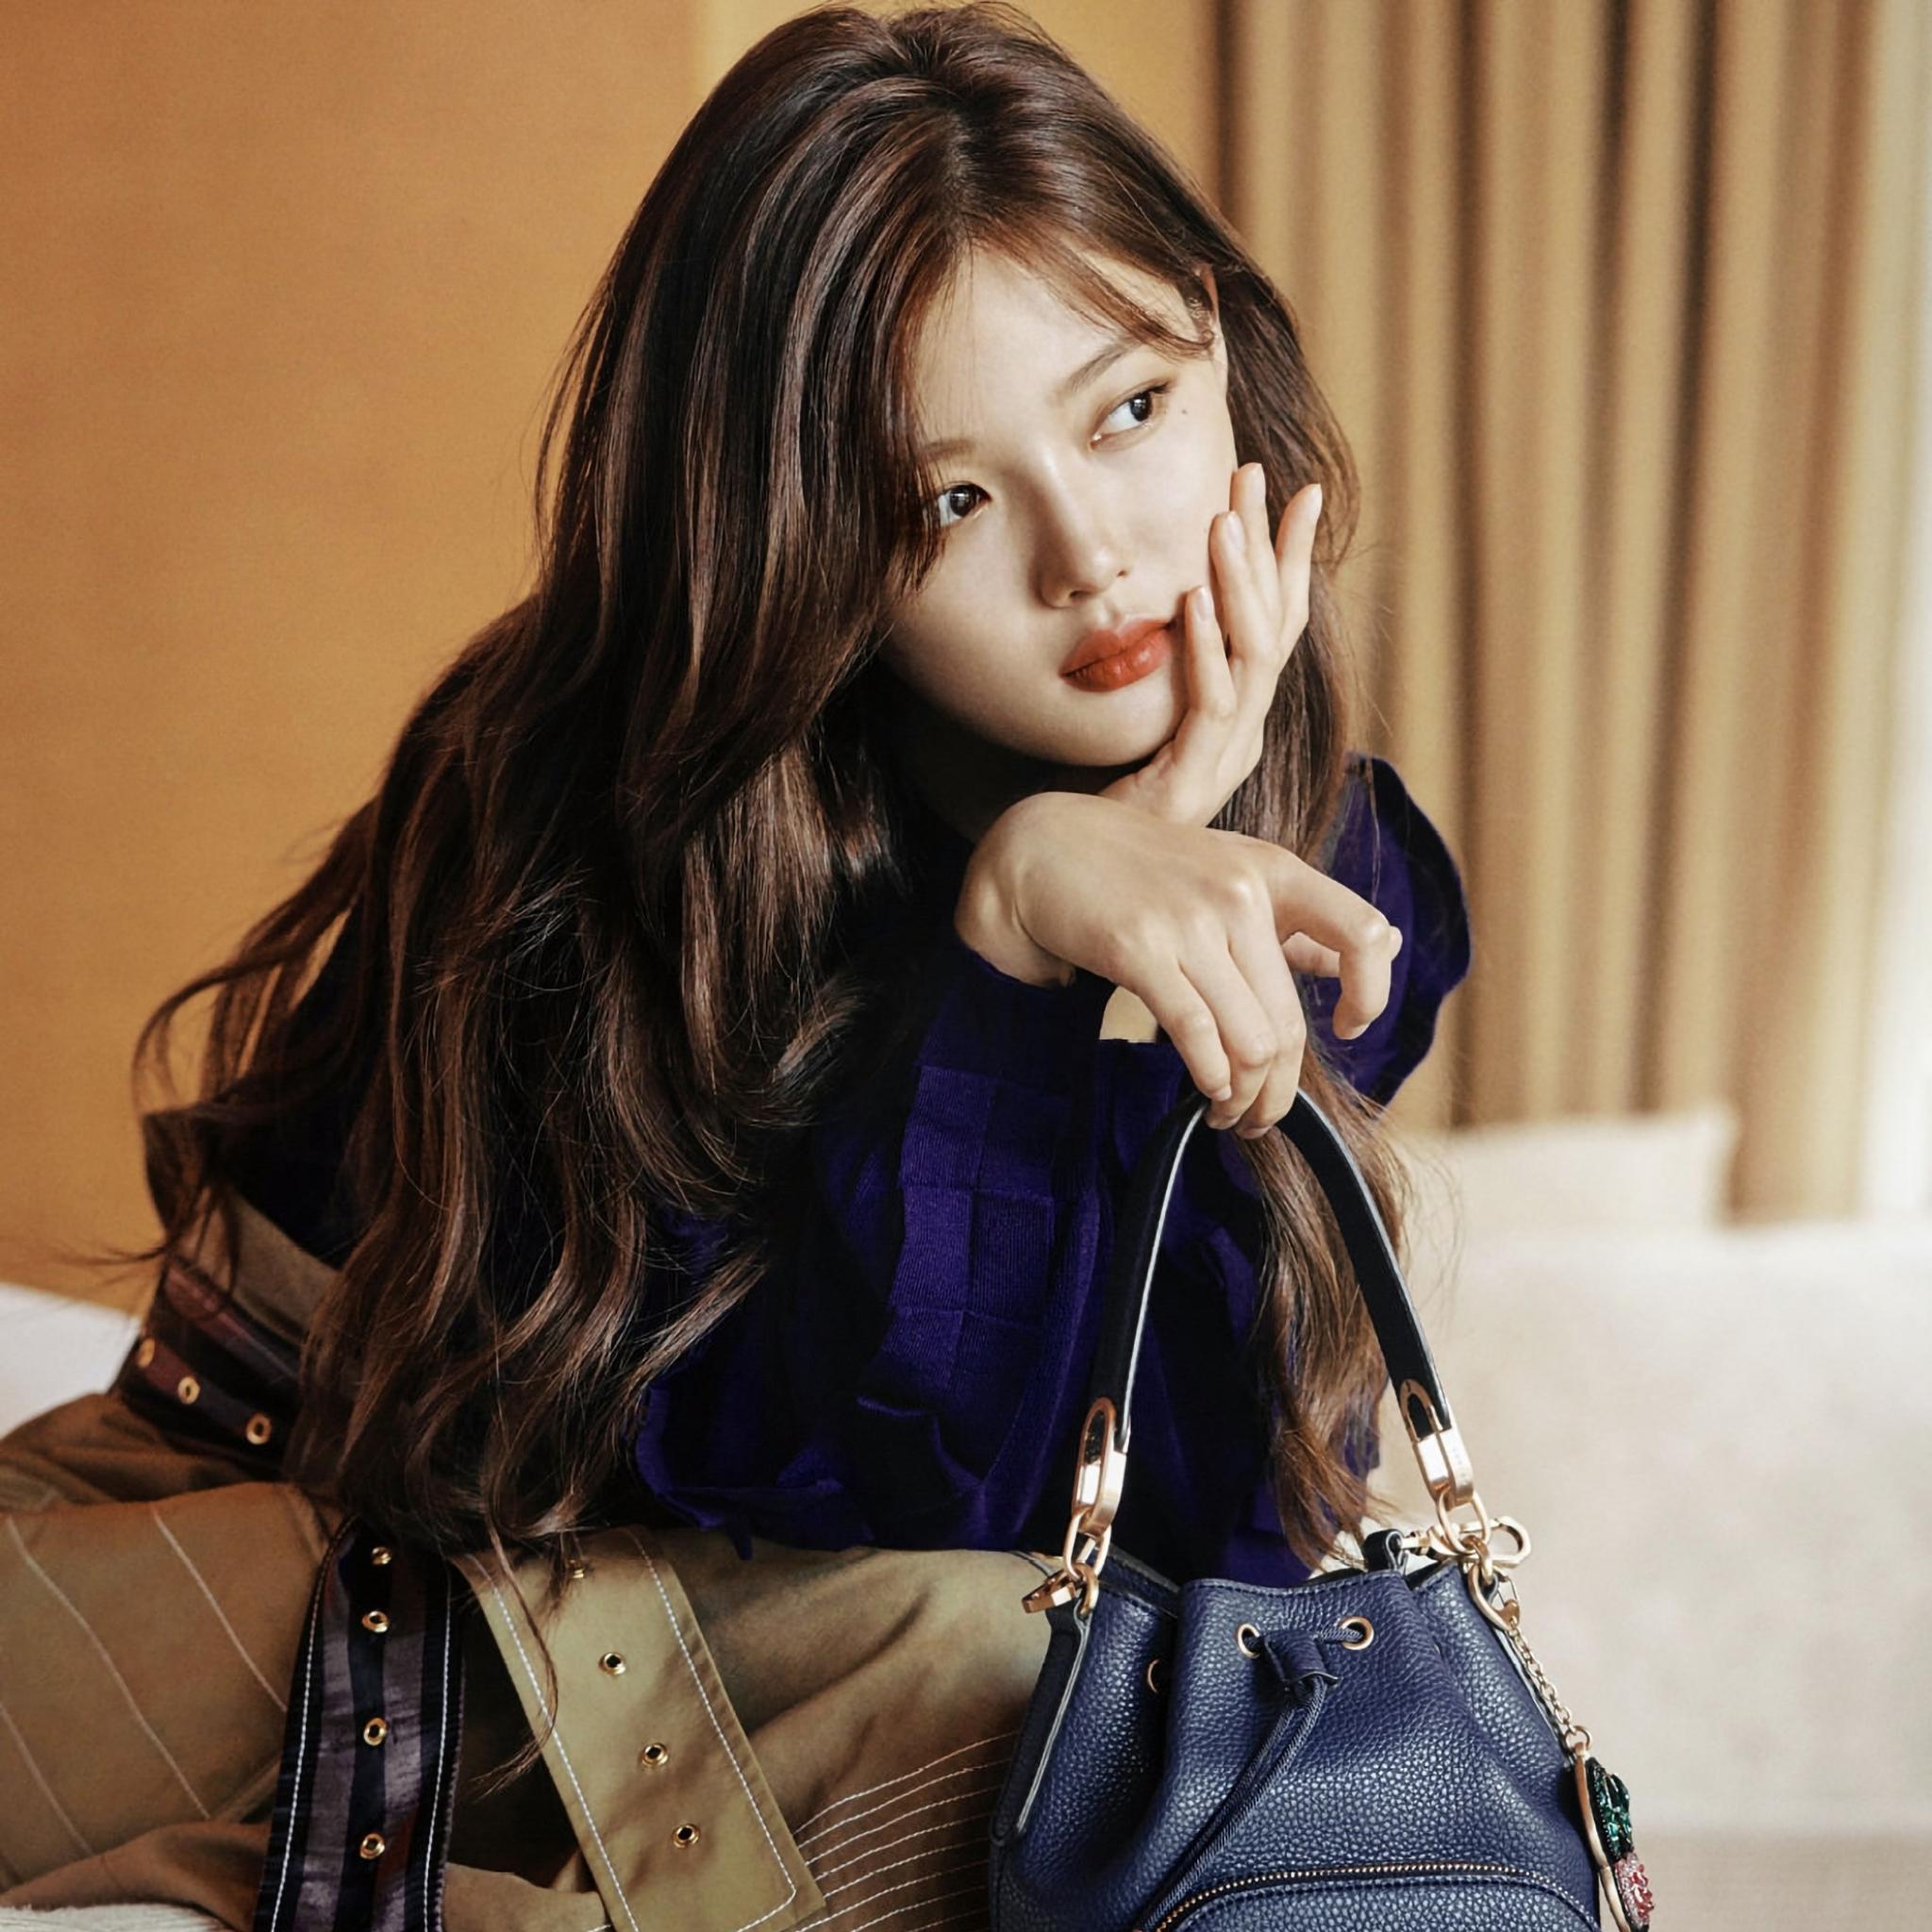 2048x2048 Kim Yoo Jung Actress Ipad Air Wallpaper Hd Celebrities 4k Wallpapers Images Photos And Background